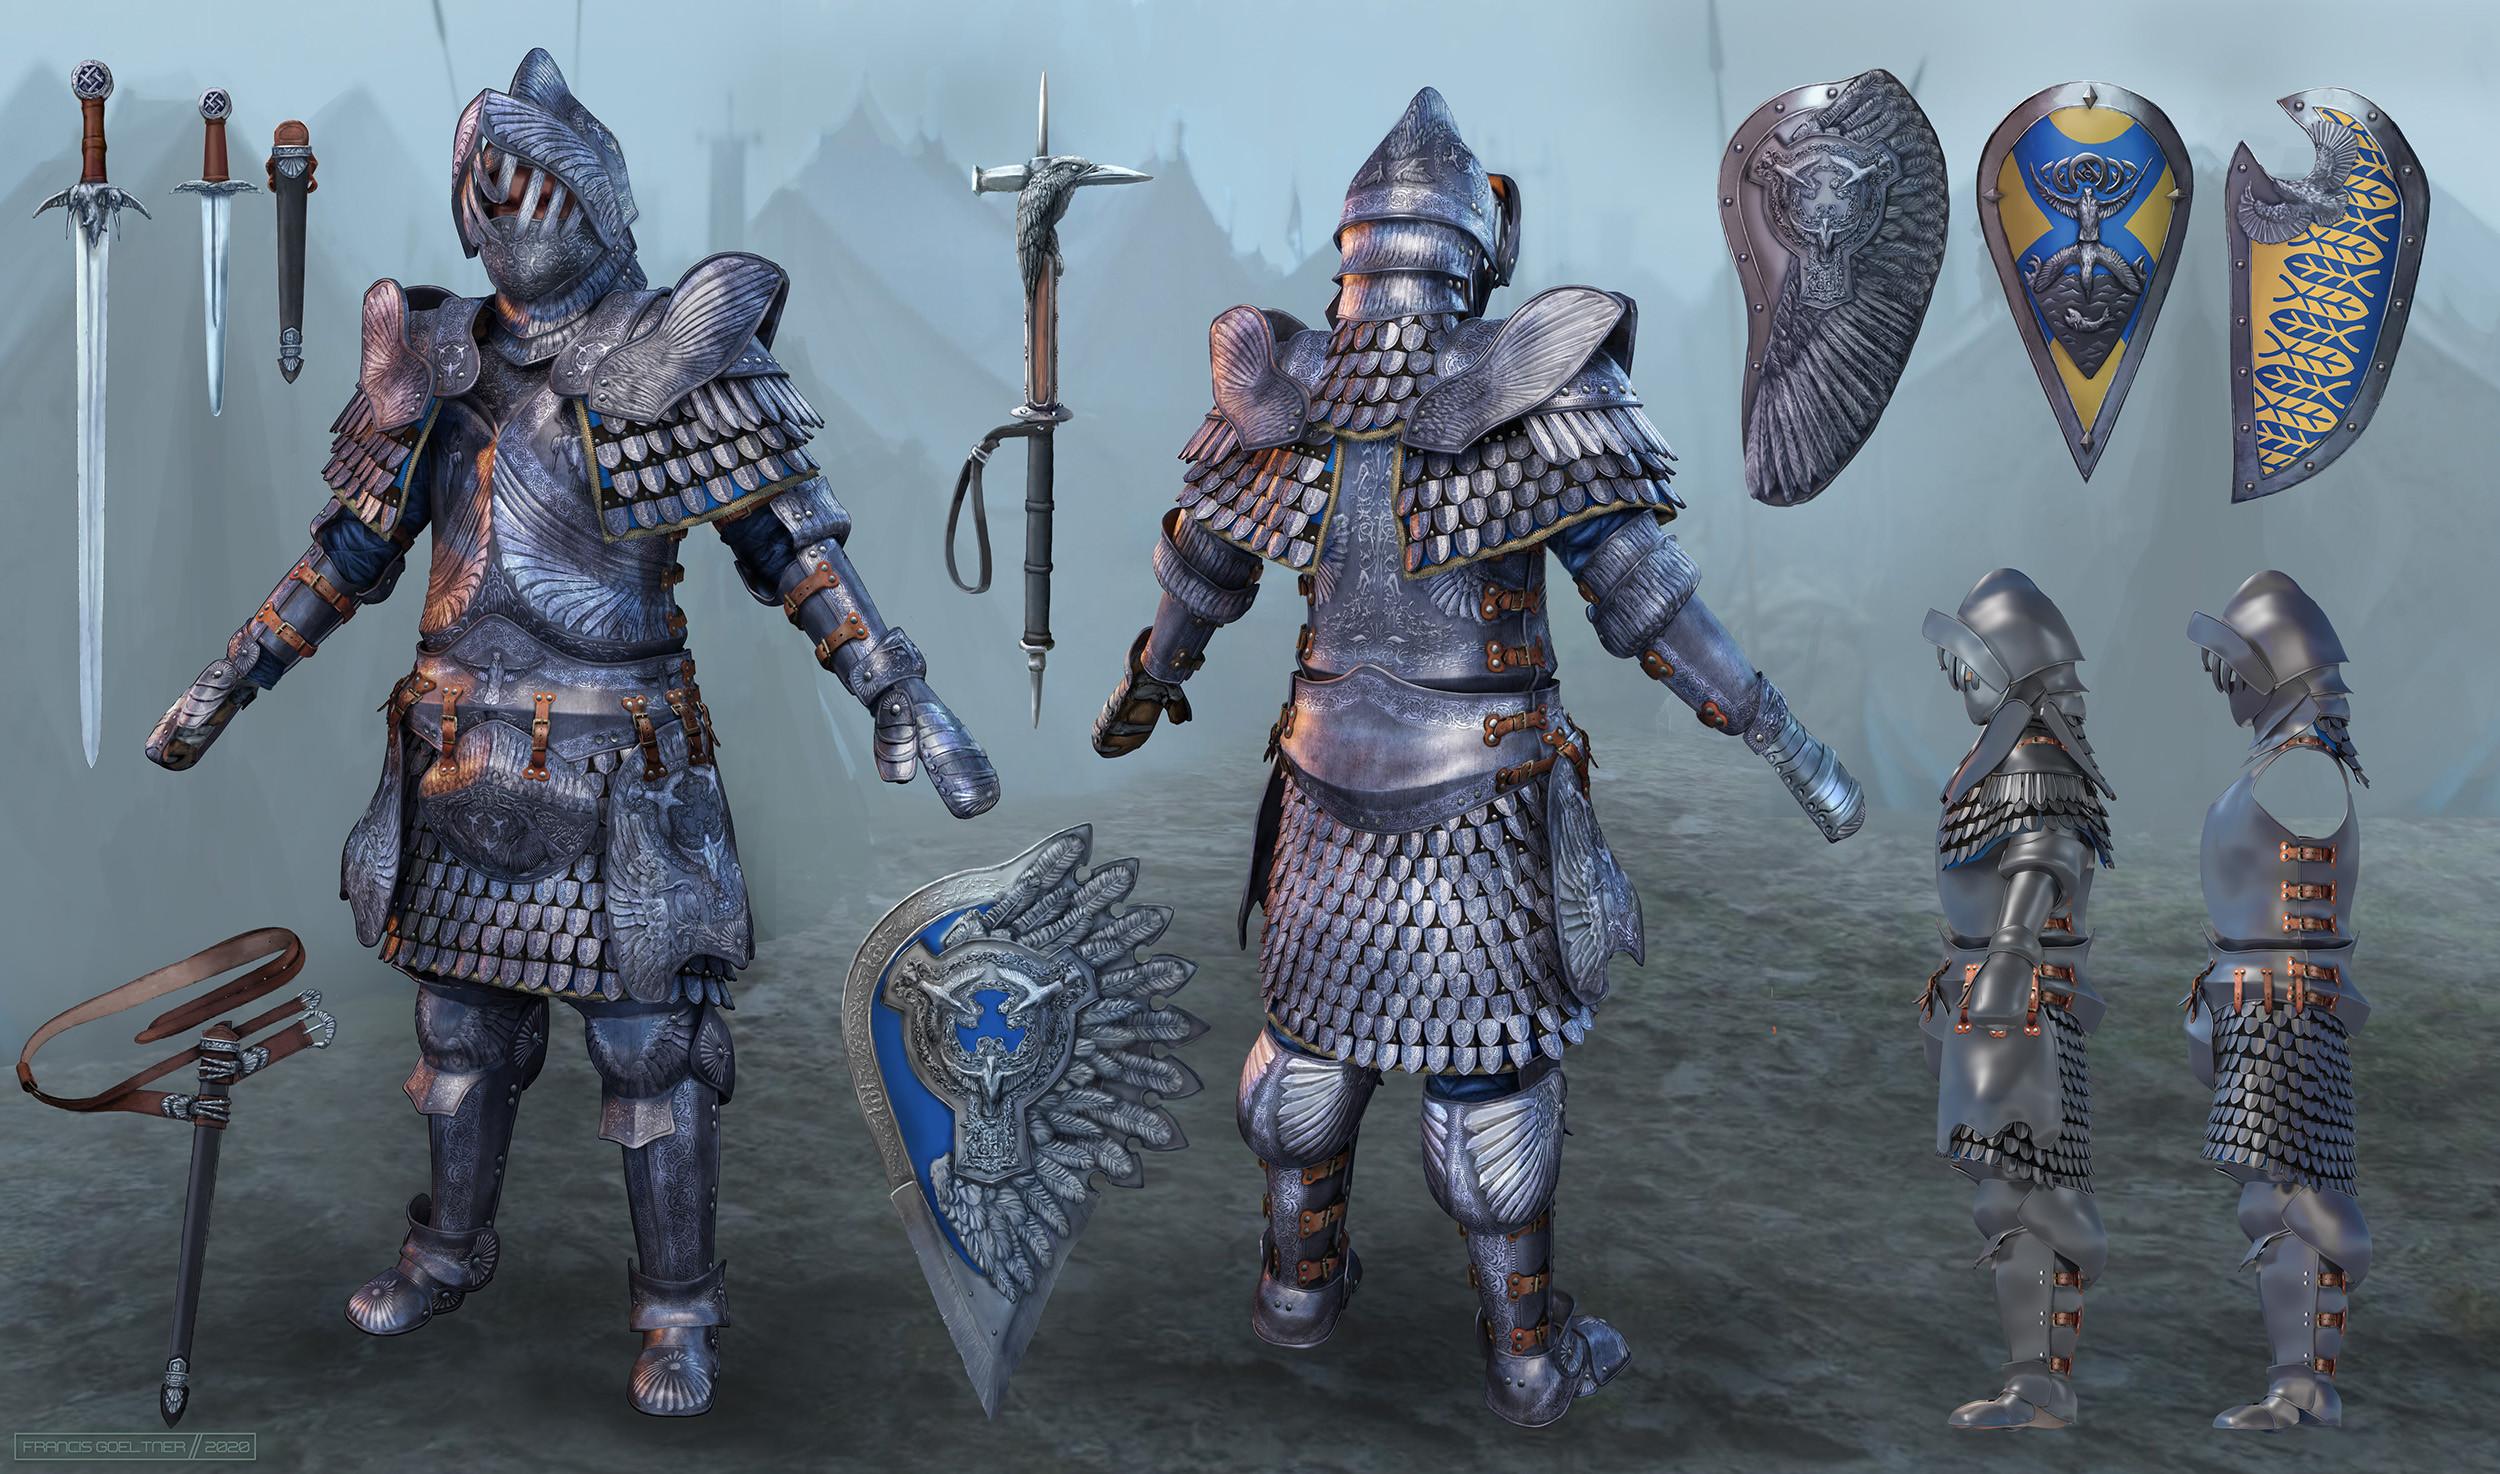 The Siege: Knight Armor Design